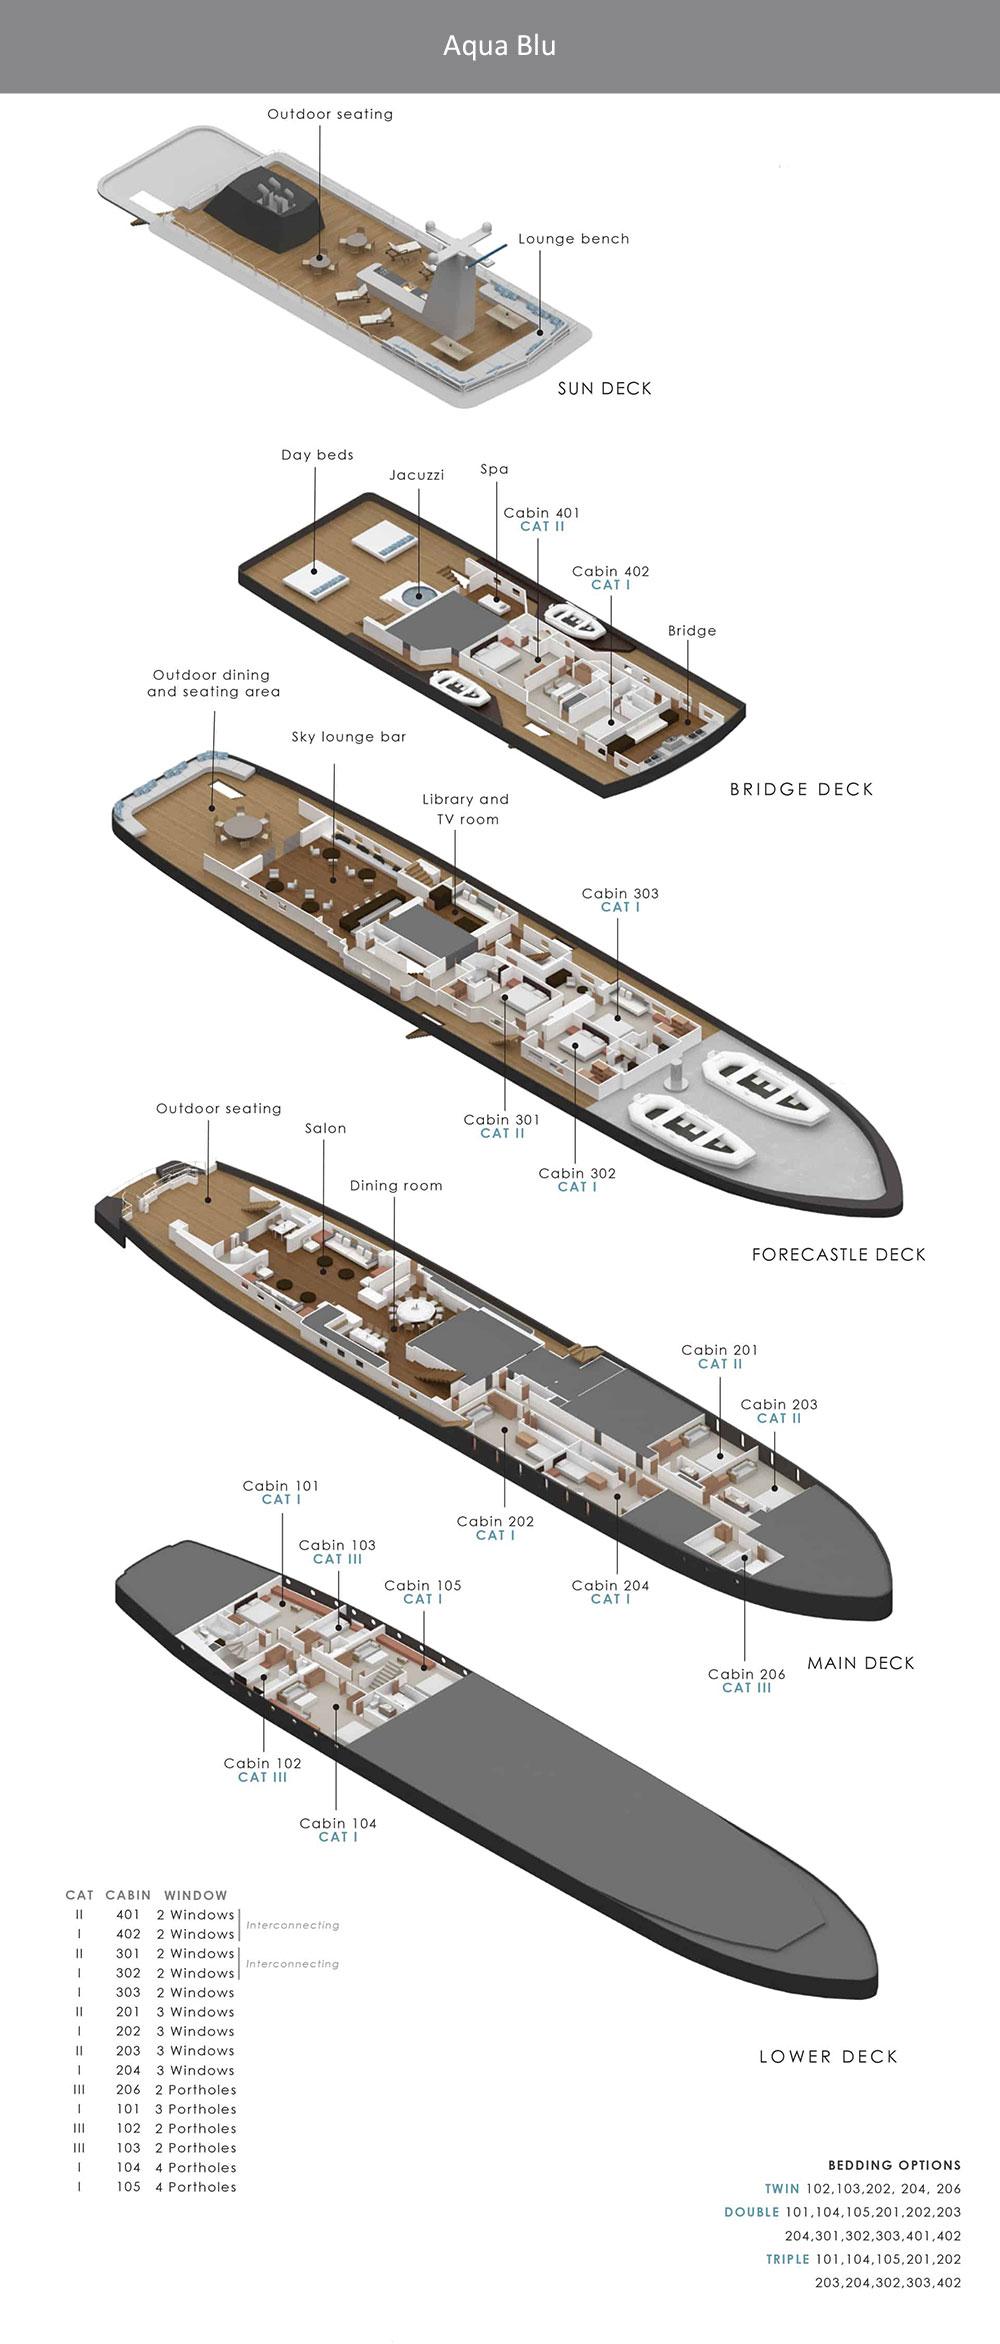 Aqua Blu Deck Plan